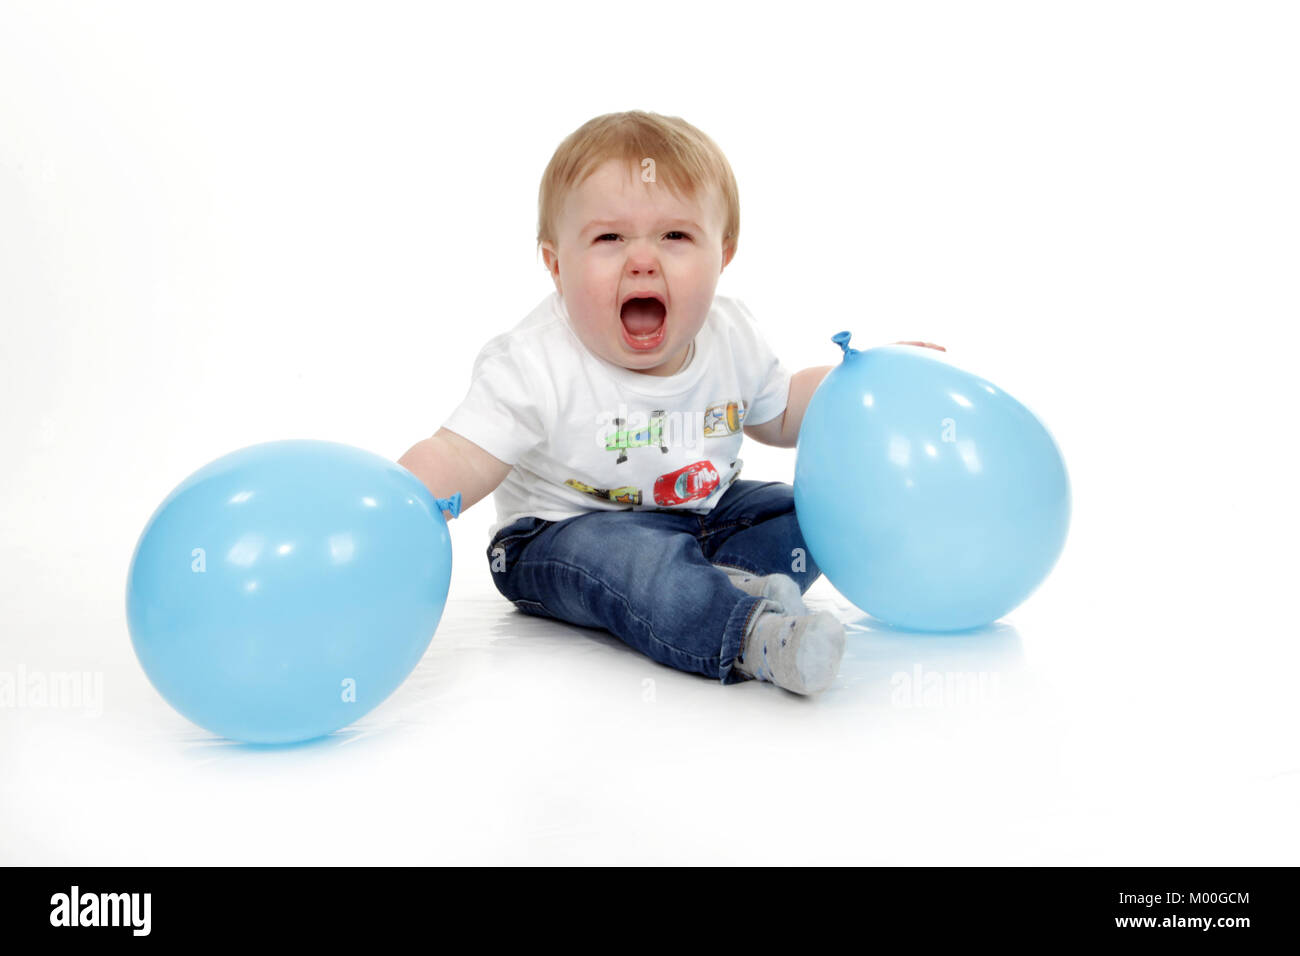 aggressive toddler, bad behaviour, temper tantrum, 1 year old boy